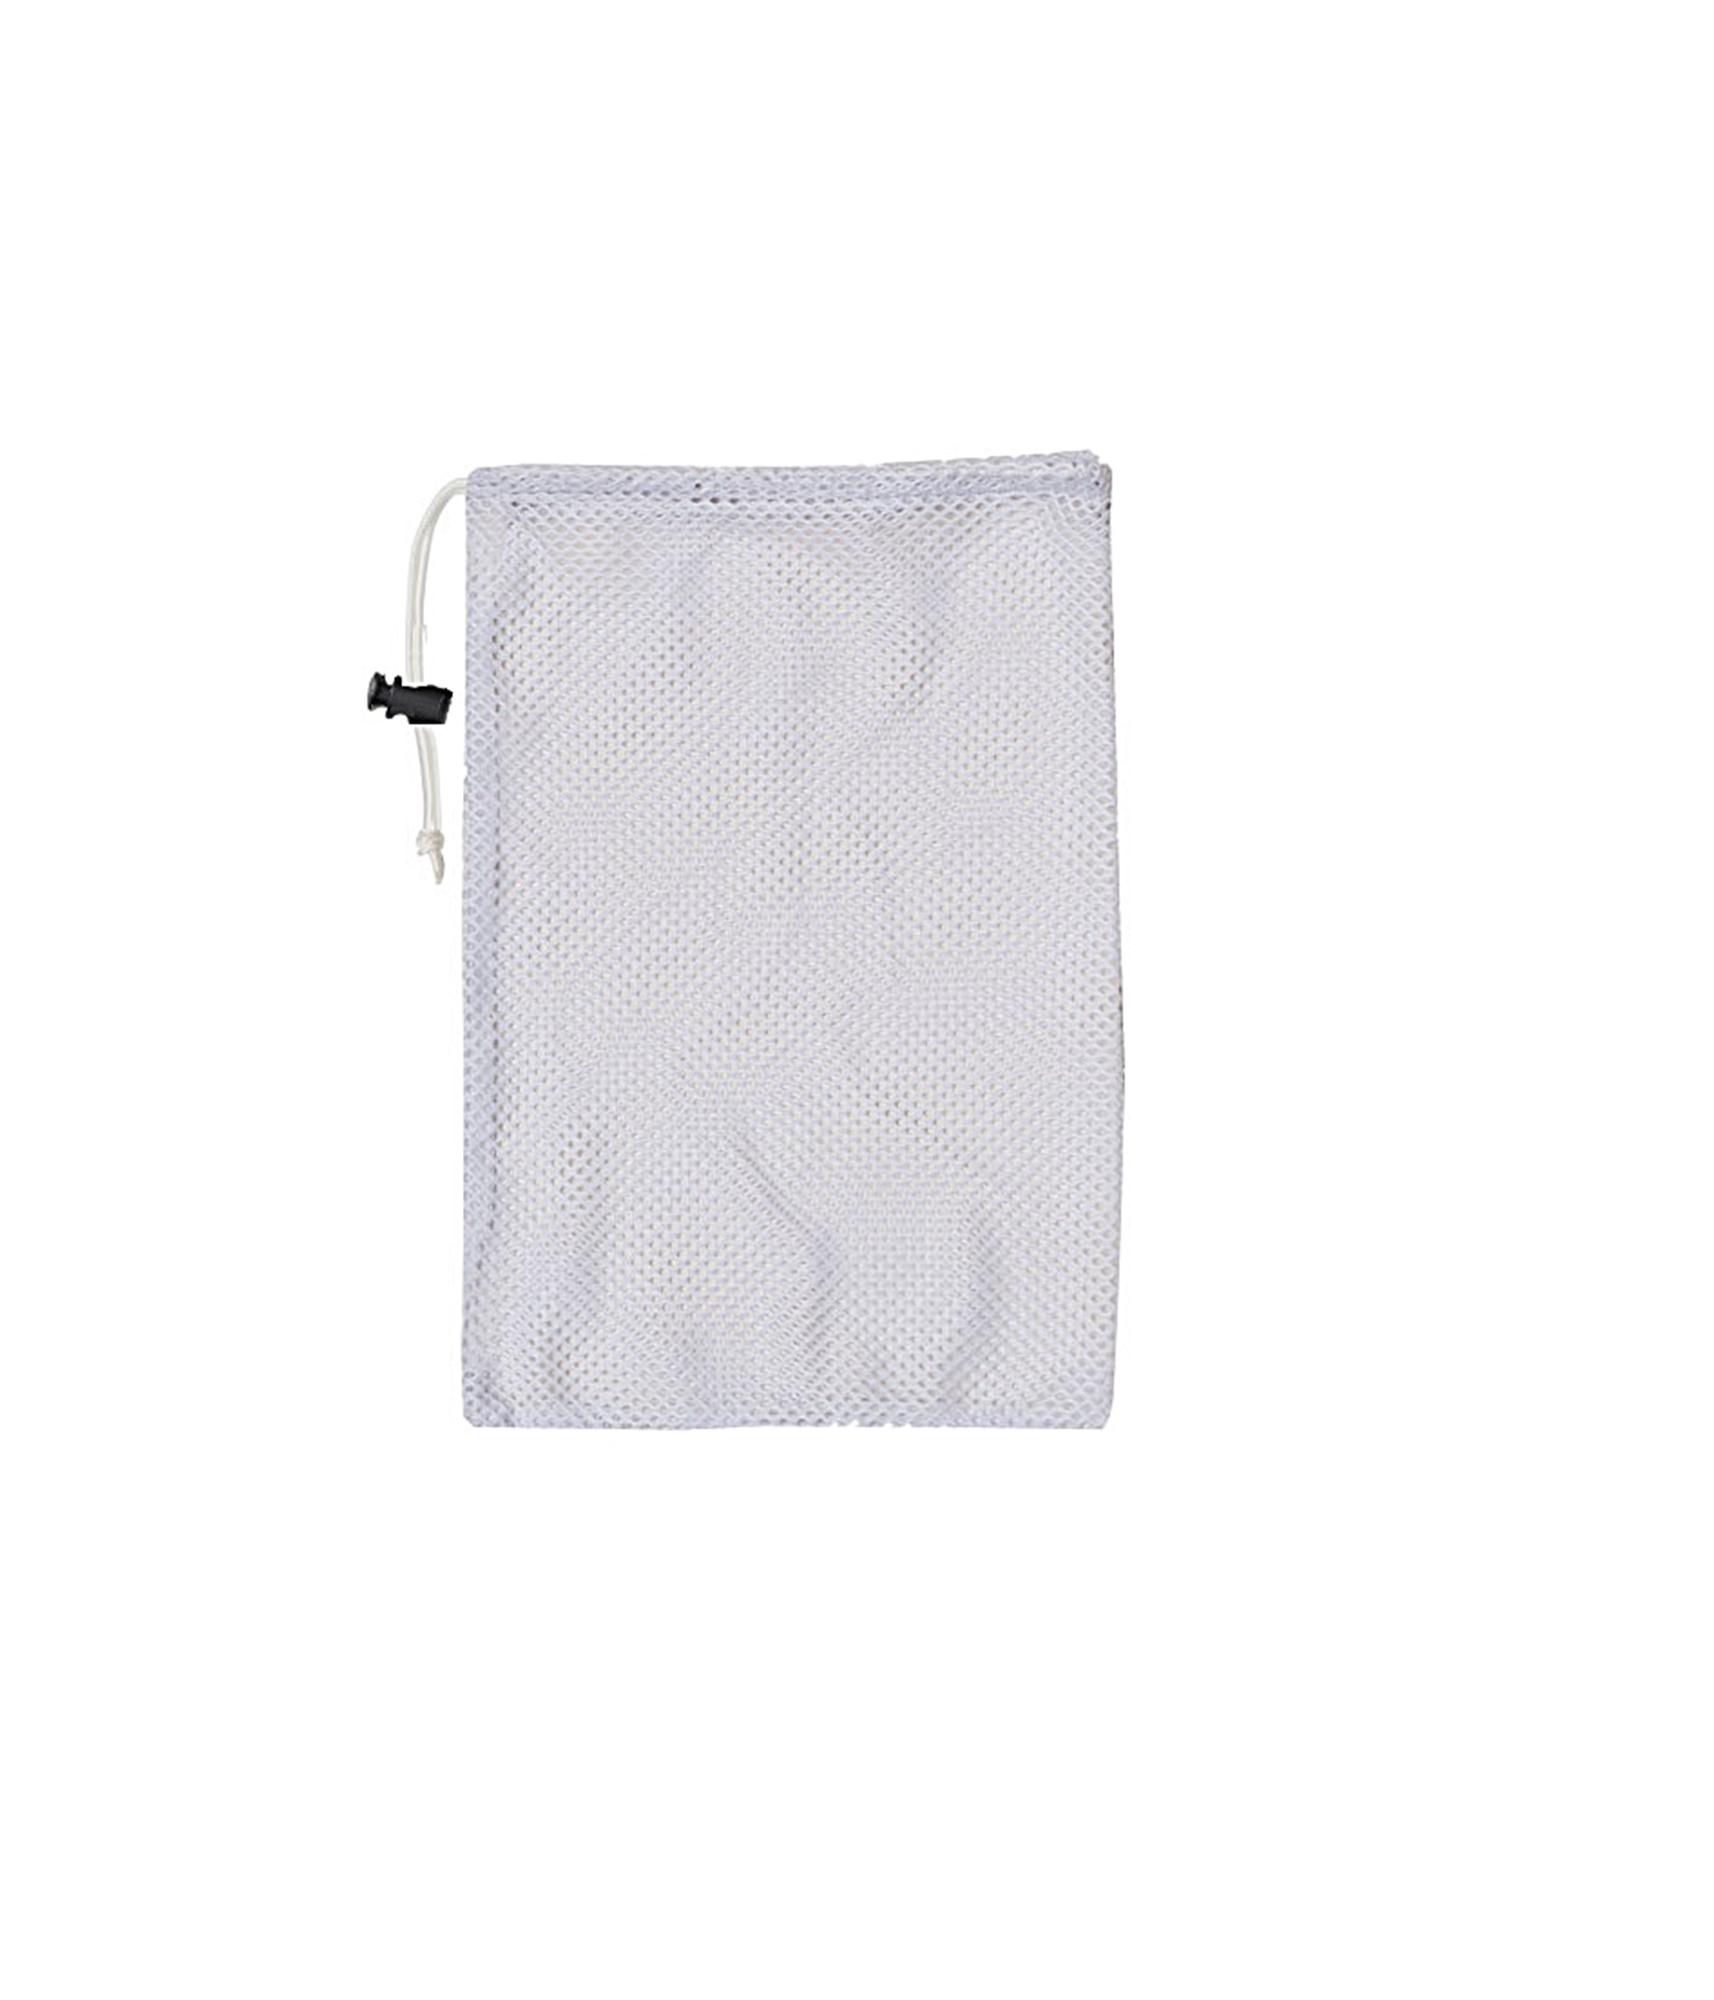 Armor Bags Mesh Small Bag 15 X 20 White